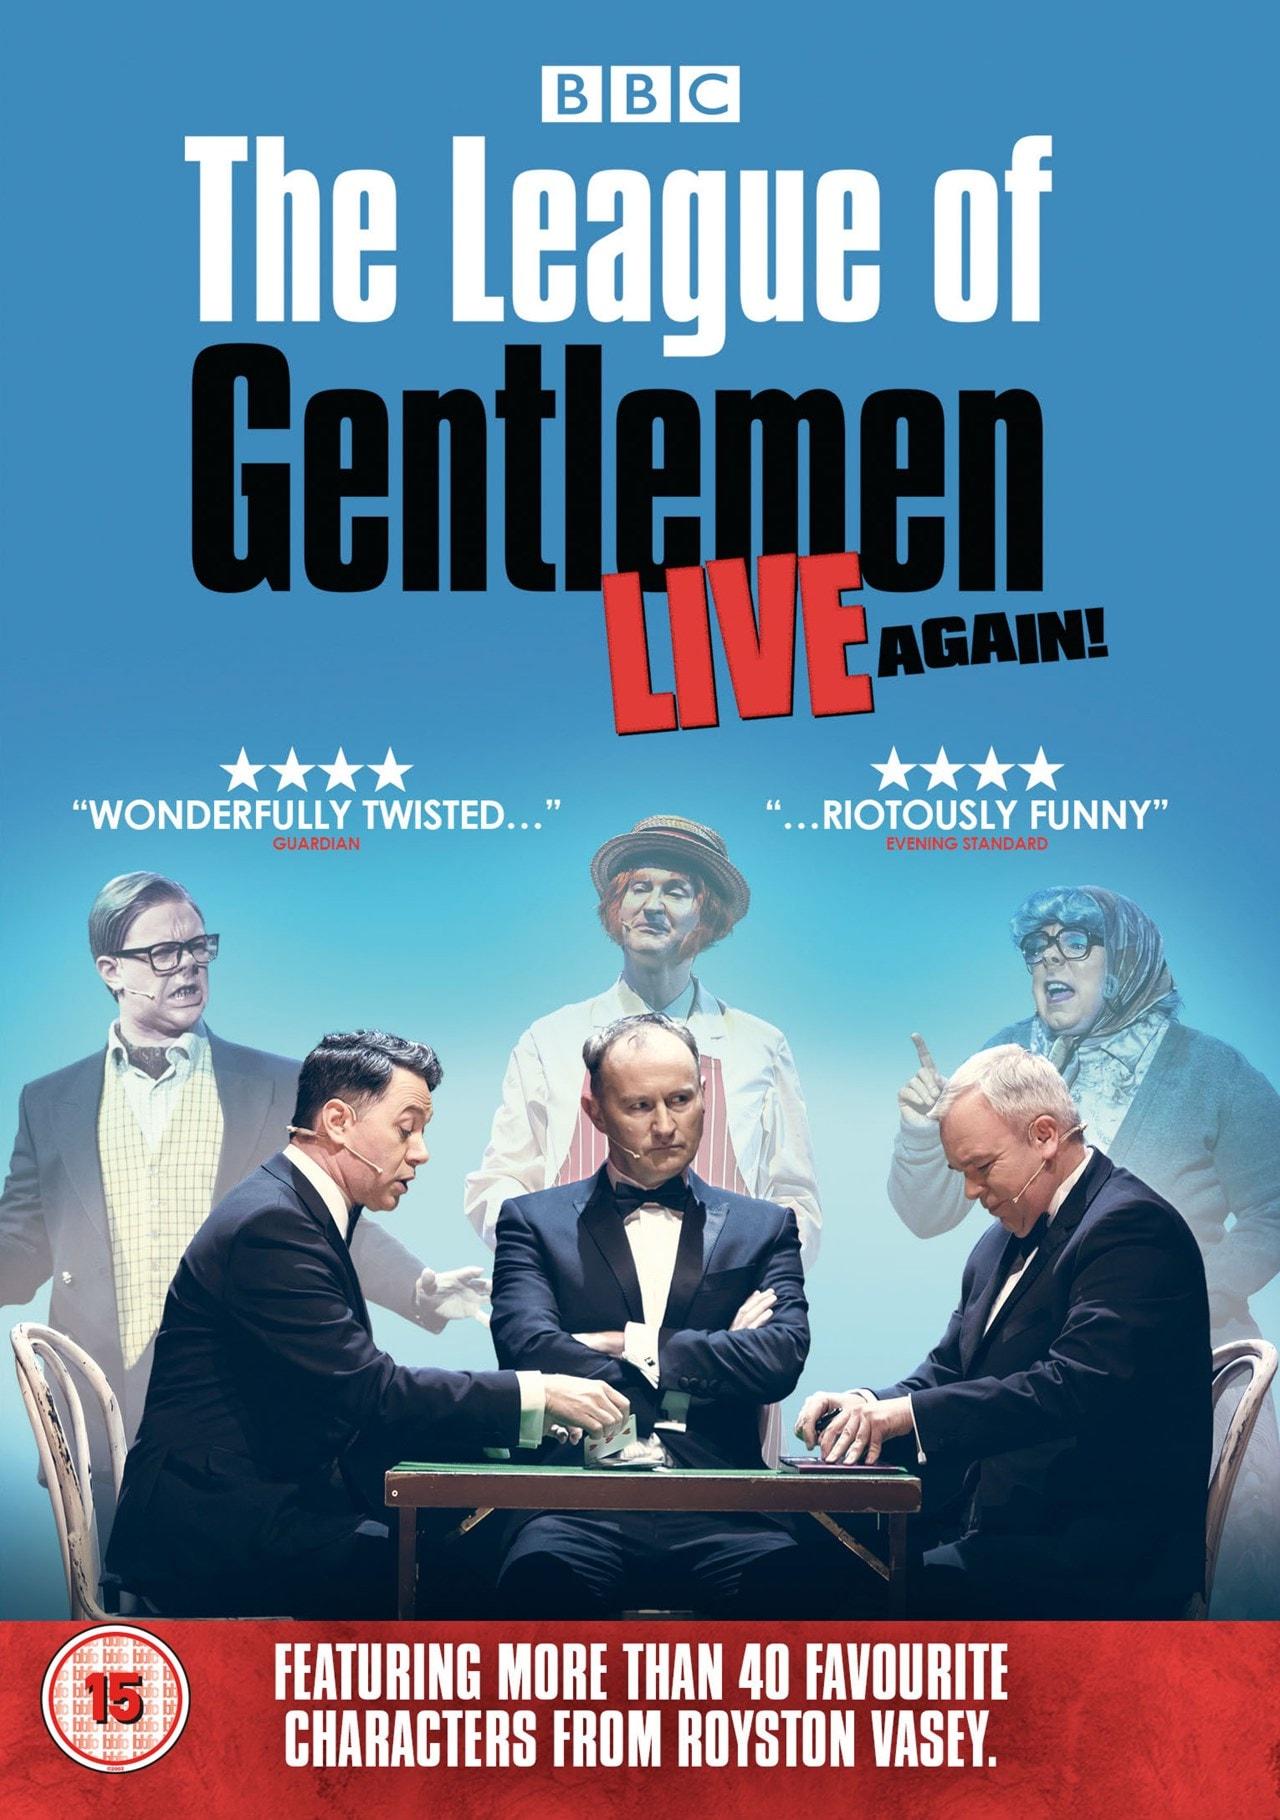 The League of Gentlemen: Live Again! - 1